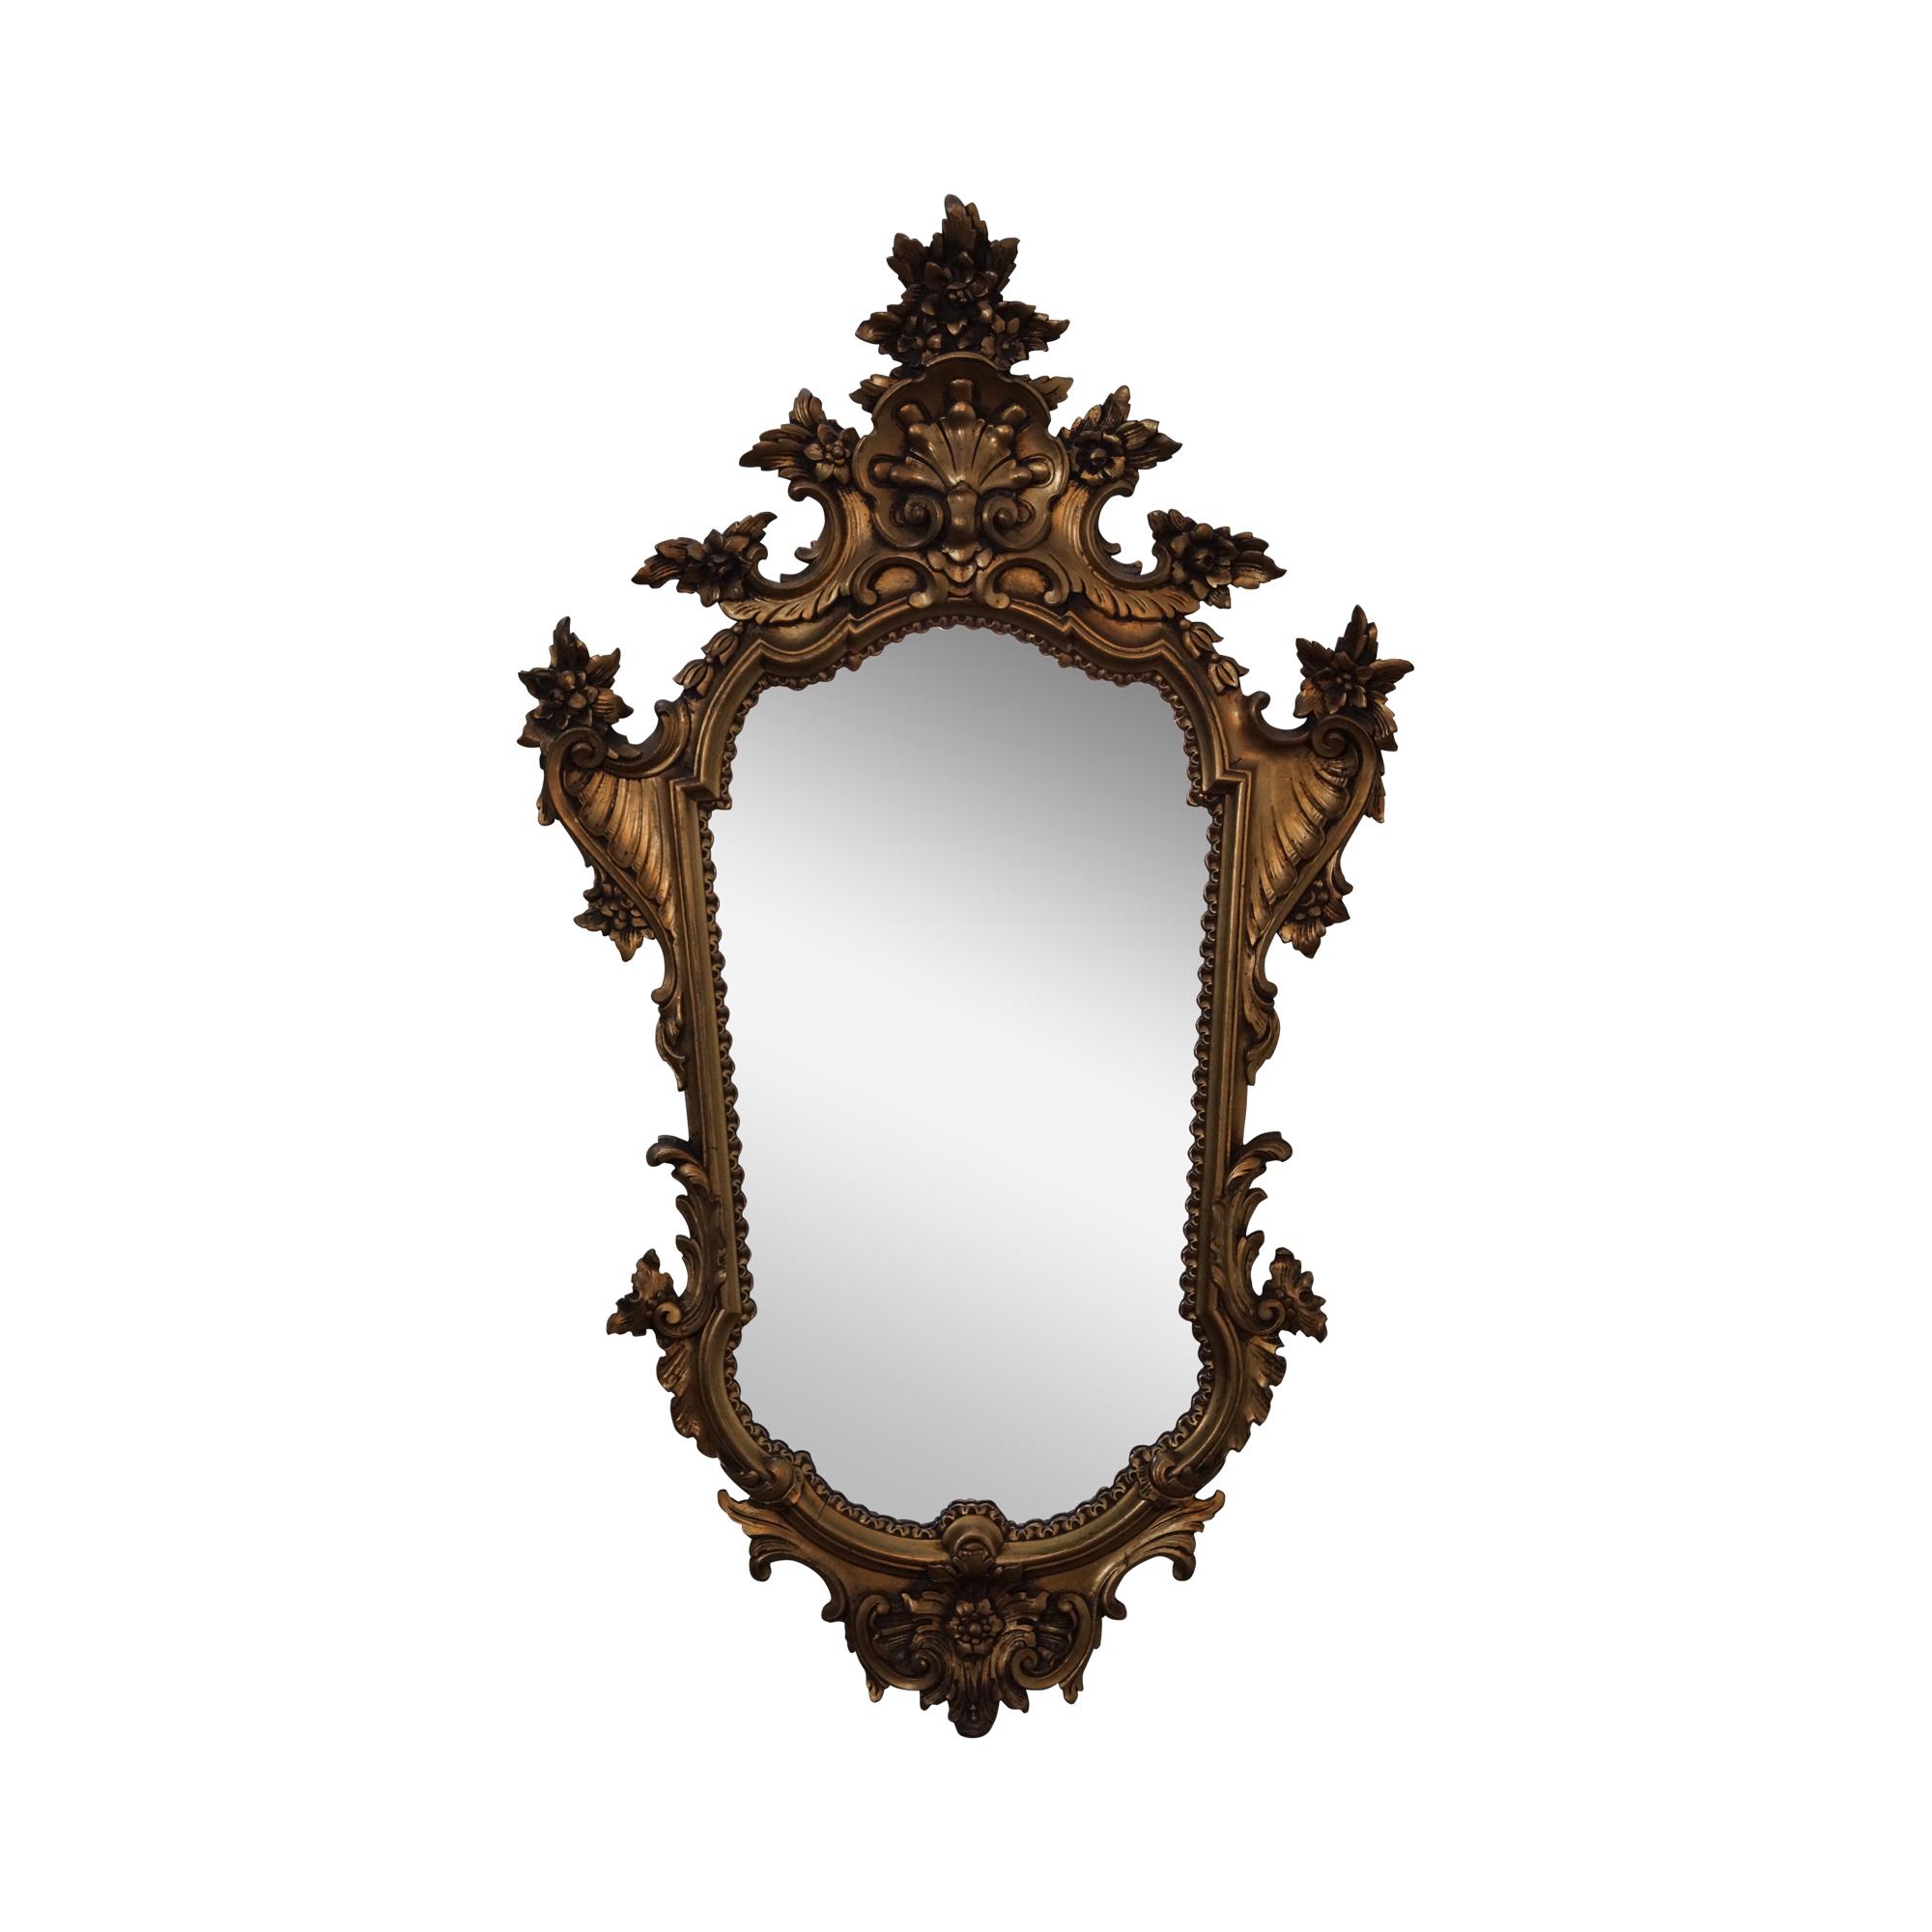 1950s gilt wood rococo hanging wall mirror chairish amipublicfo Choice Image